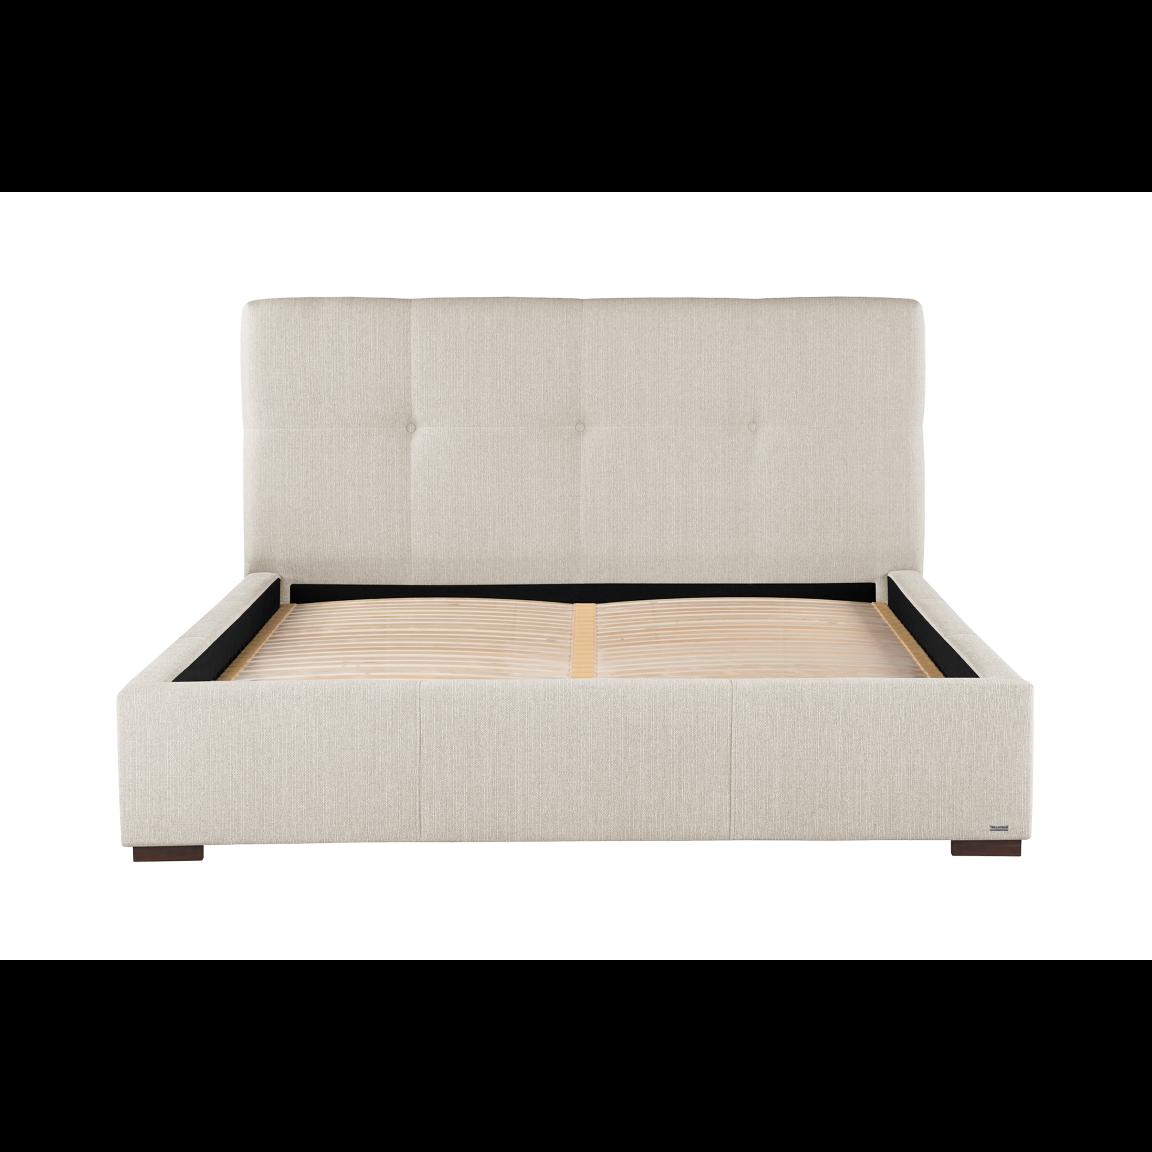 Gepolstertes Bett Cobalt | Creme-140 x 190 cm